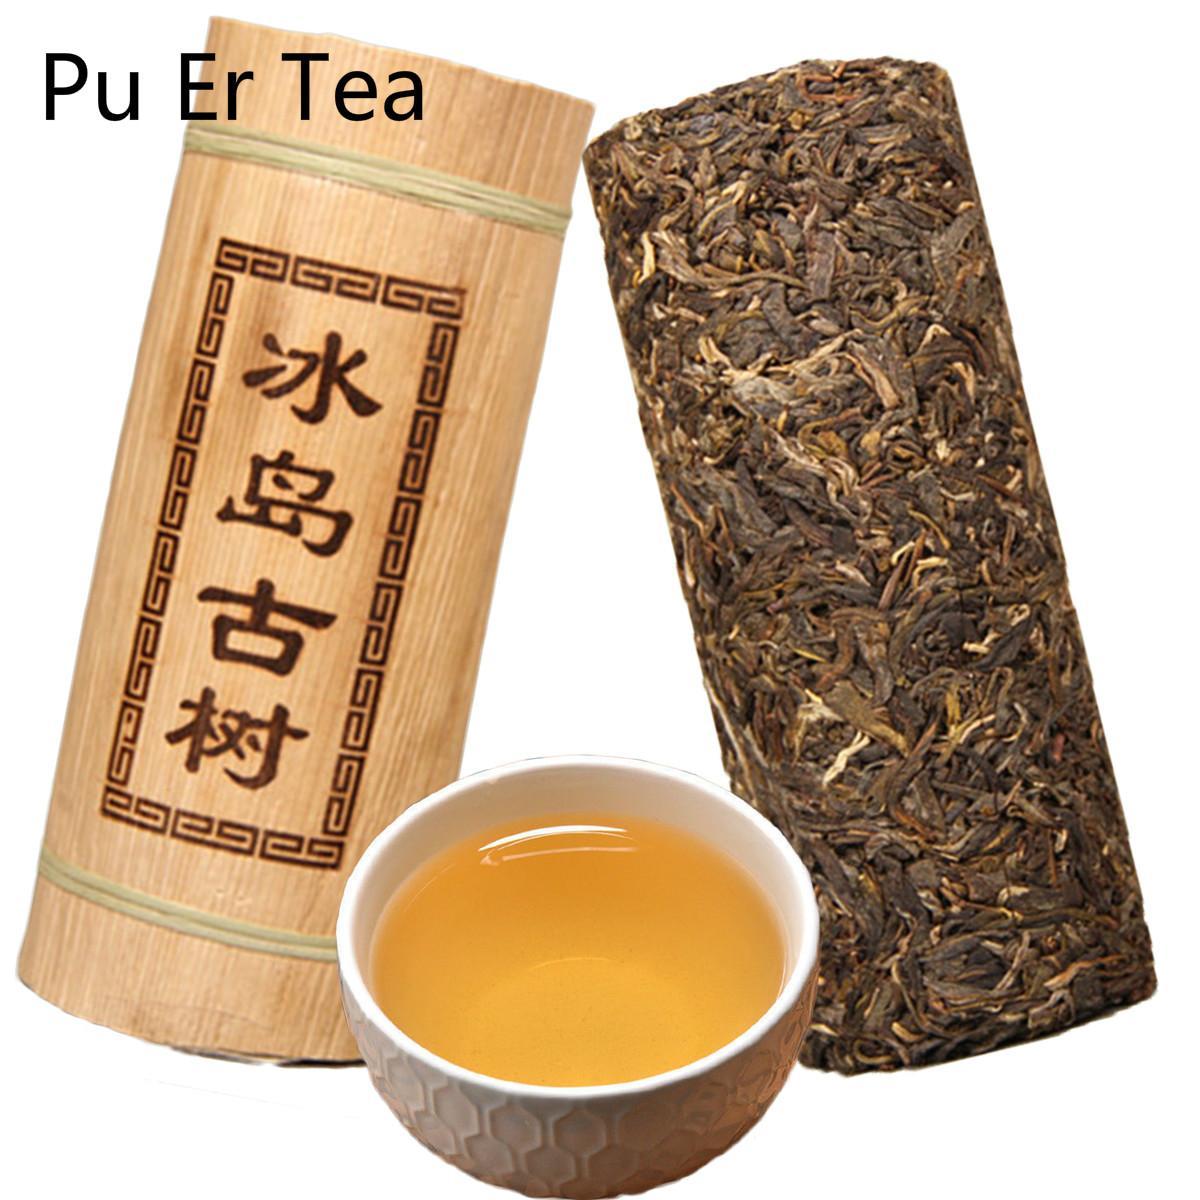 Promotion 500g Yunnan Island alten Baum Puerh Tee Bambus Zylindrische Form Verpackung Roh Tee Grüne Lebensmittel-PU-äh Tee